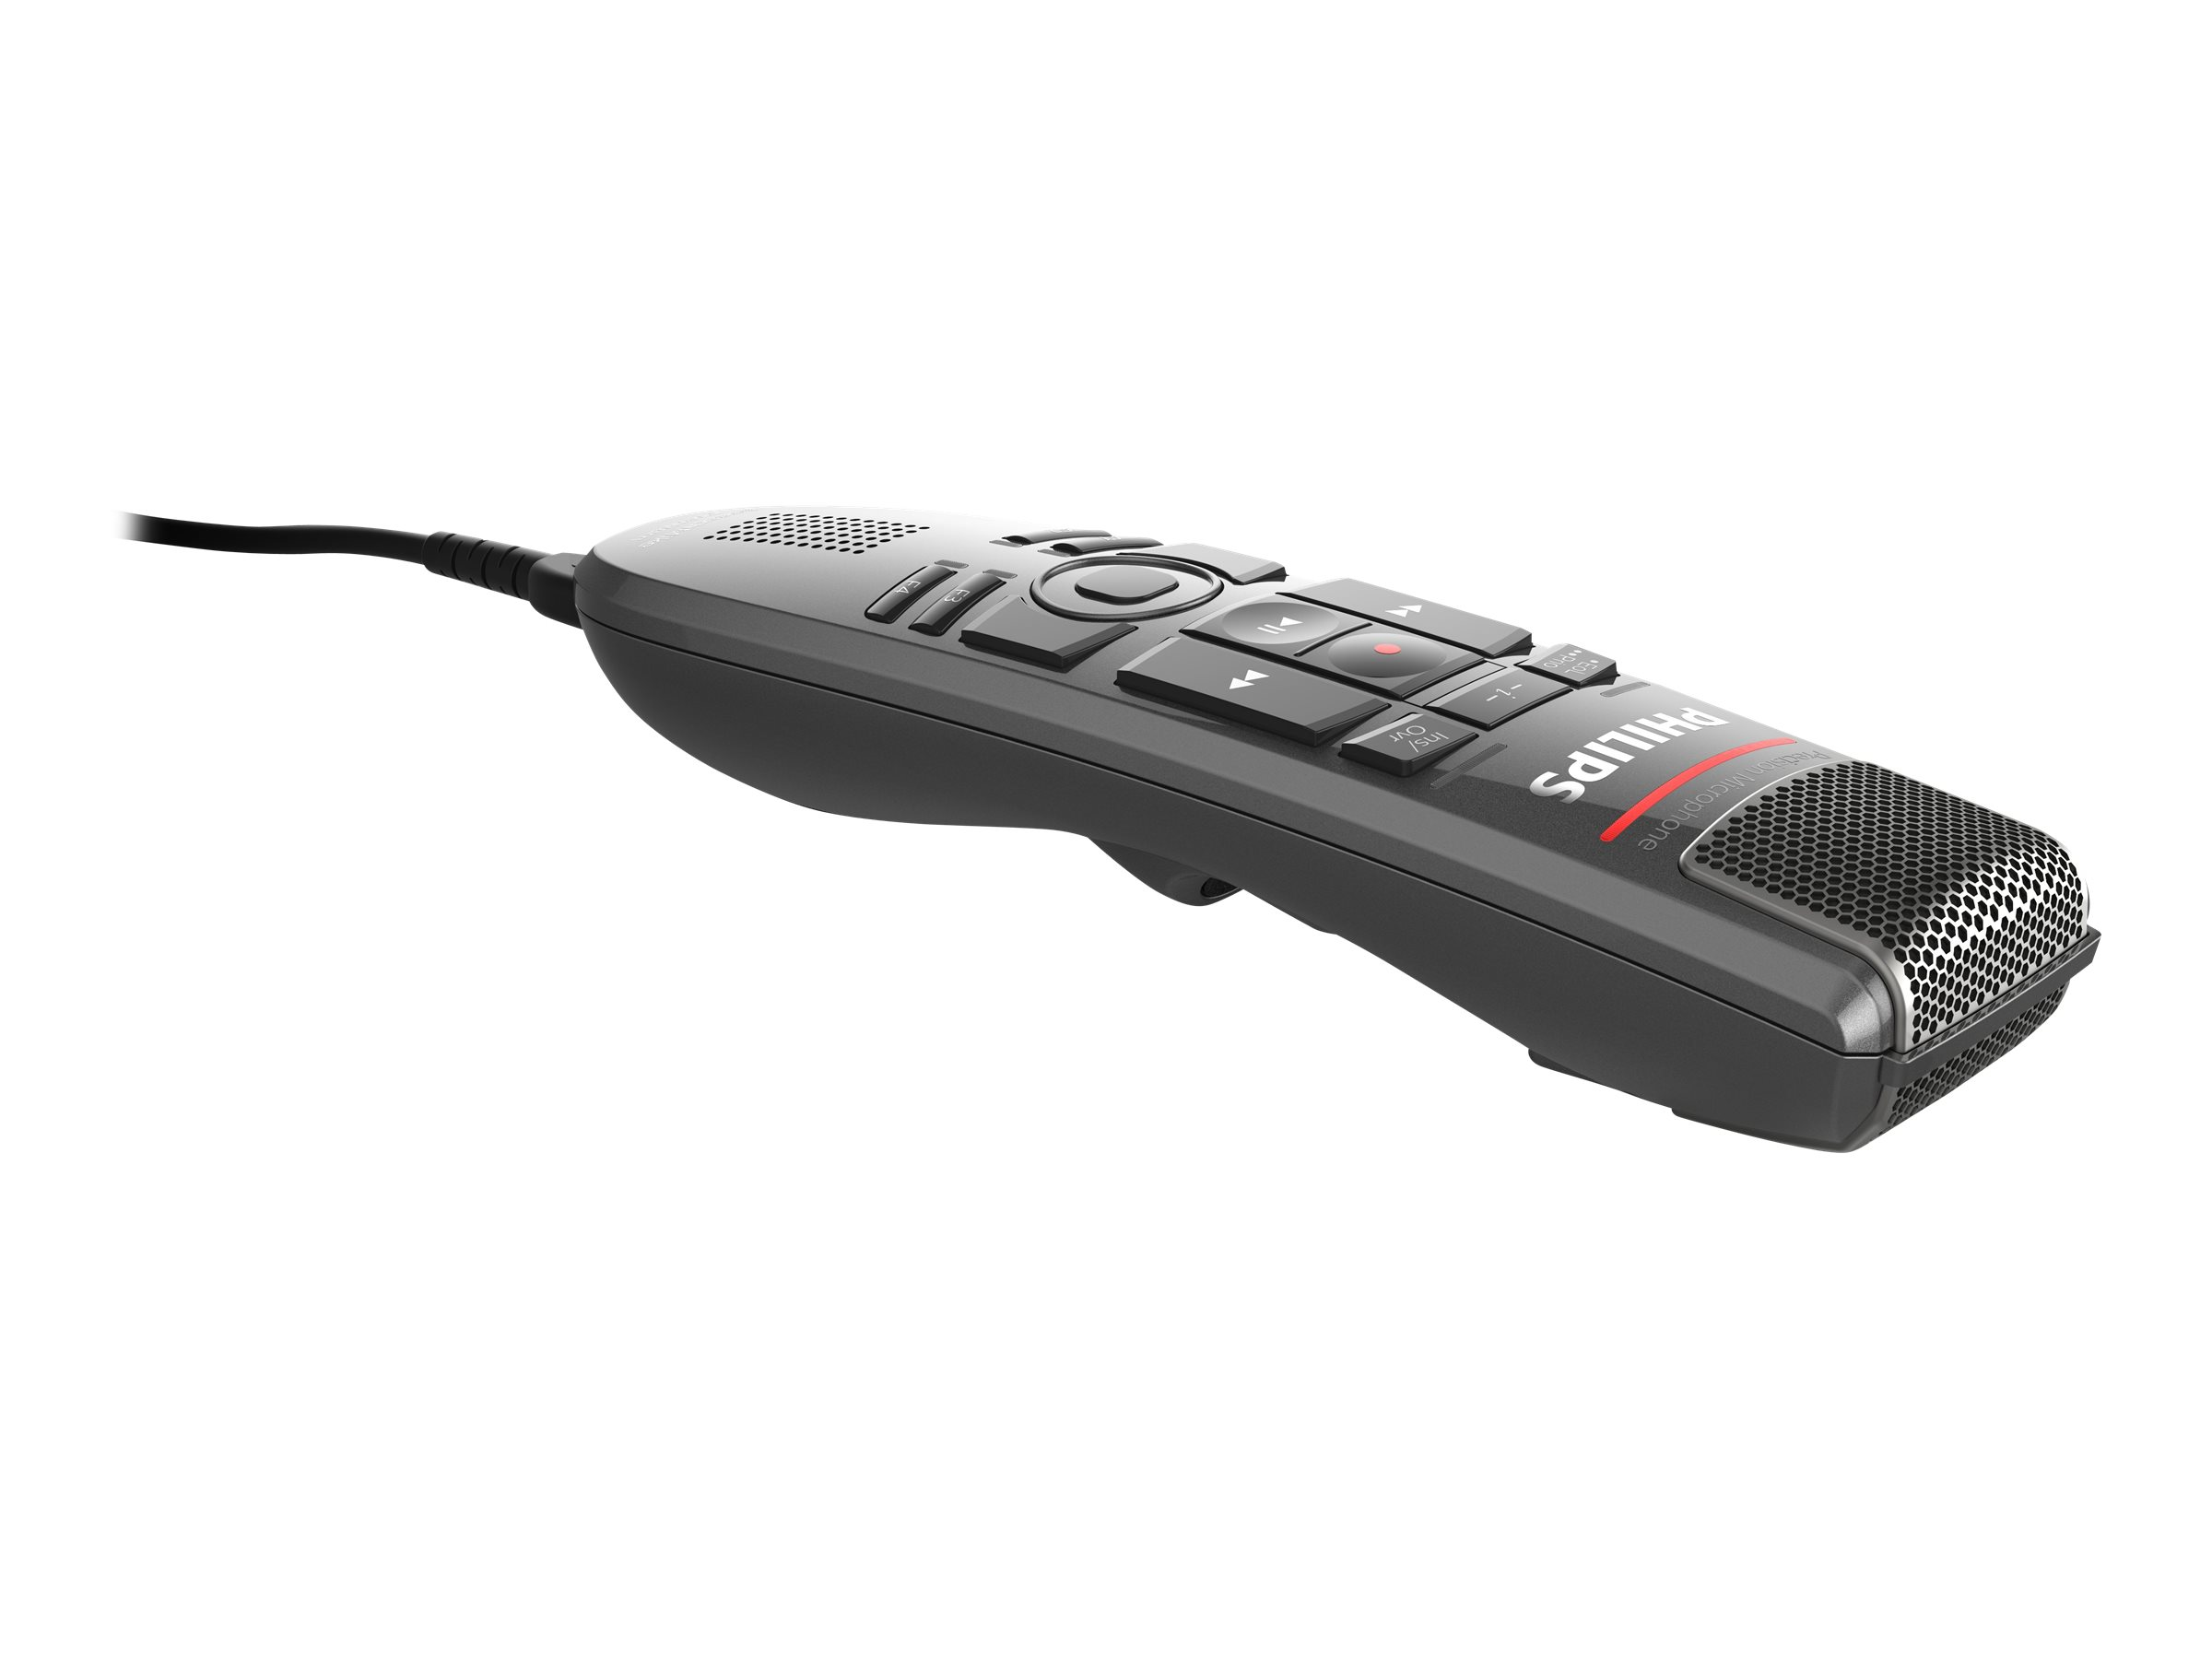 Philips SpeechMike Premium Touch SMP3700 - Lautsprechermikrofon - USB - dunkelgrau perlfarben metallisch